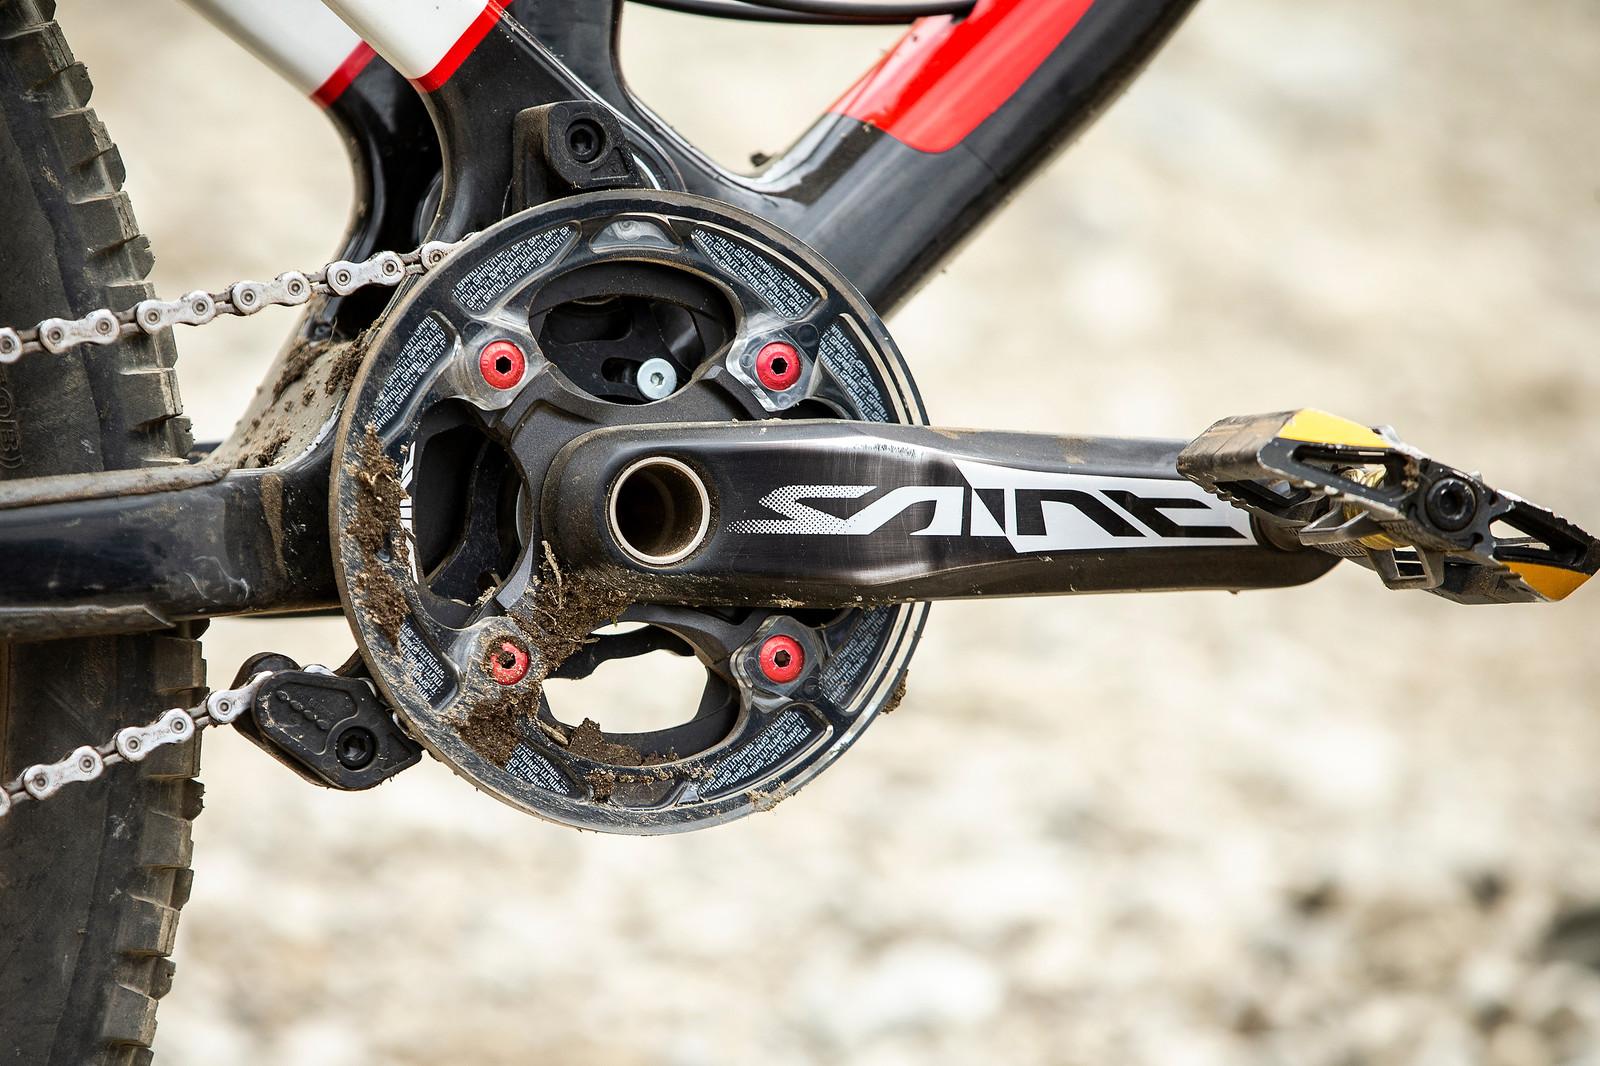 Gamut Chainguide - WINNING BIKE - Danny Hart's Saracen Myst - Mountain Biking Pictures - Vital MTB